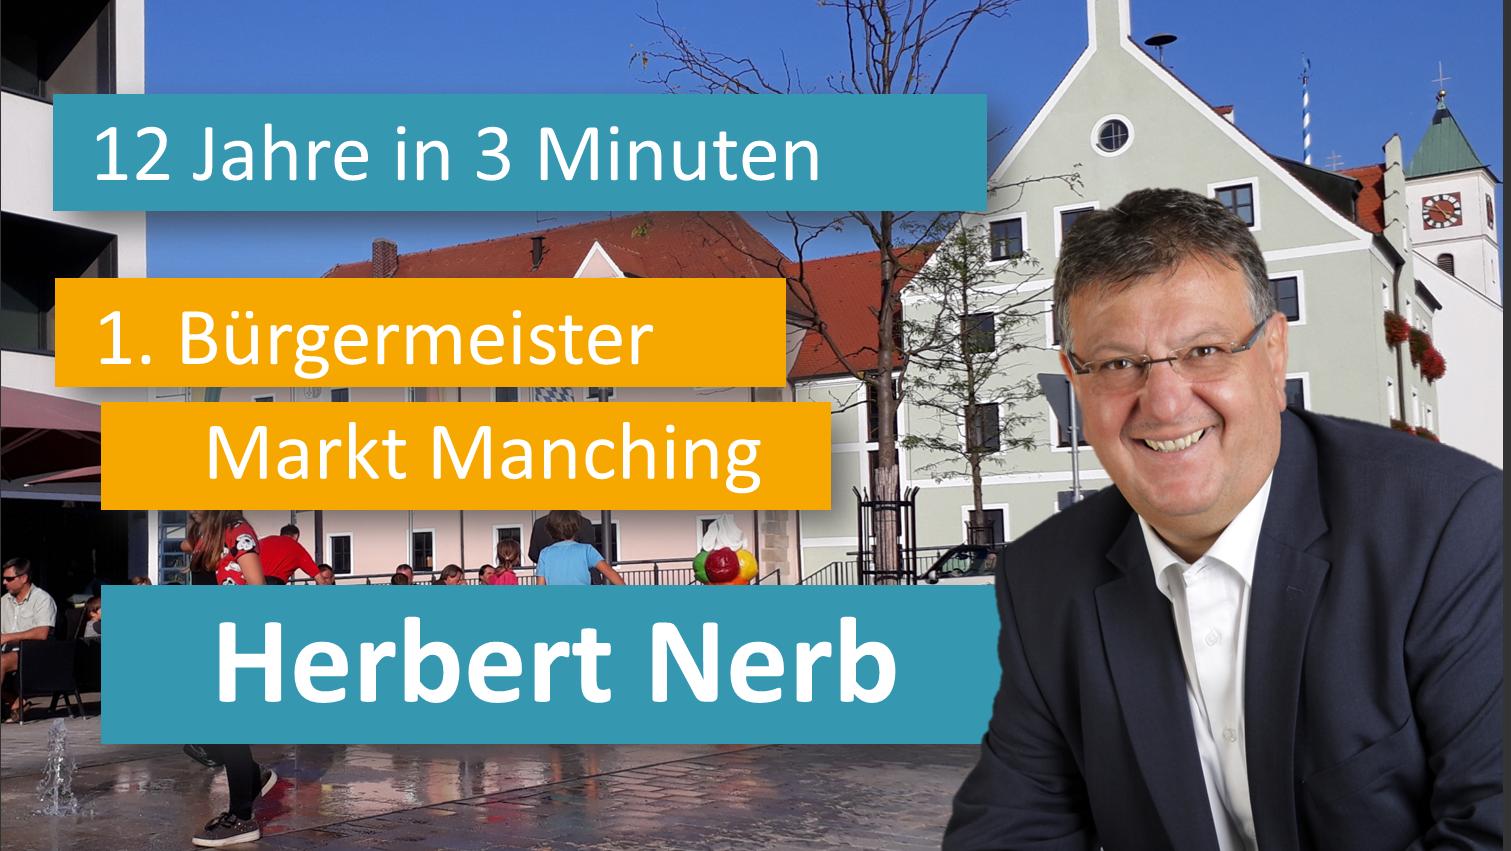 12 Jahre in 3 Minuten 1. Bürgermeister Markt Manching Herbert Nerb (Rückblick 2008-2020)